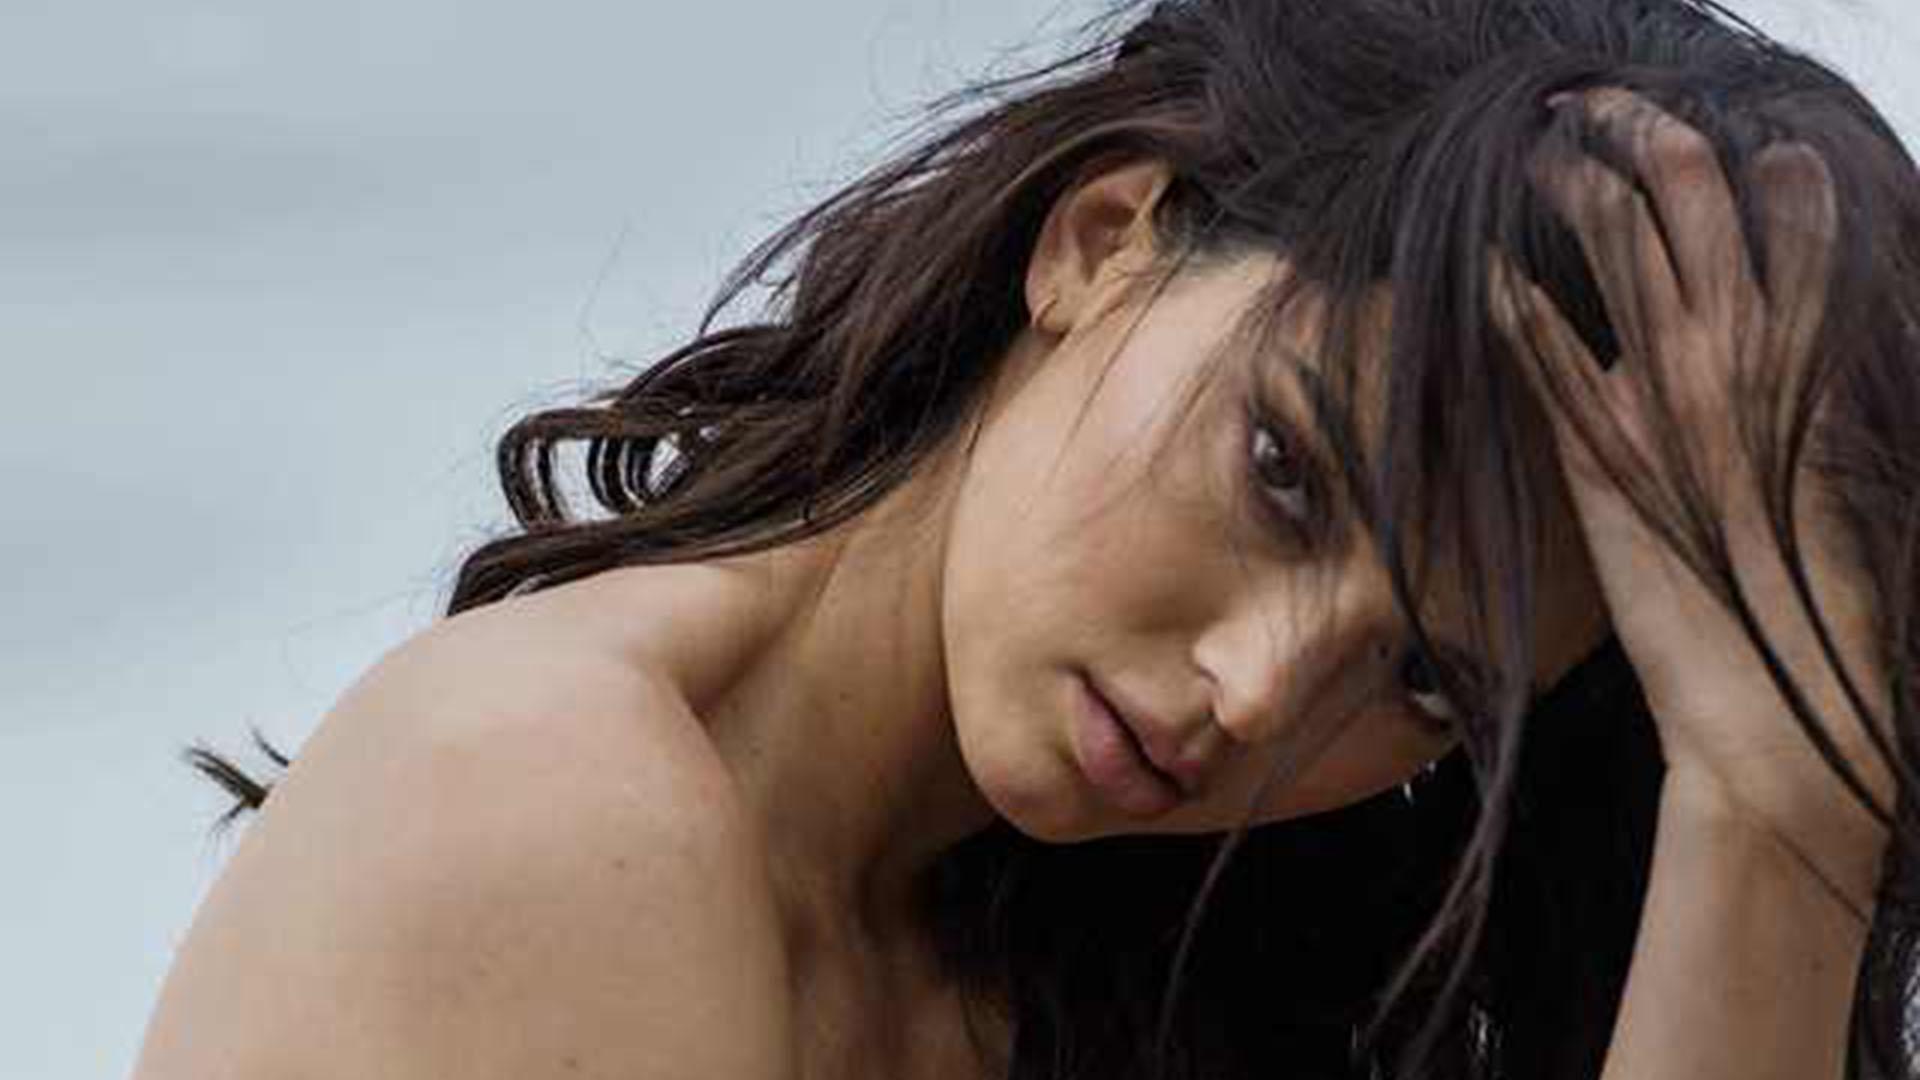 Andrea Legarreta Cojiendo filtraron fotos robadas de kendall jenner desnuda - infobae